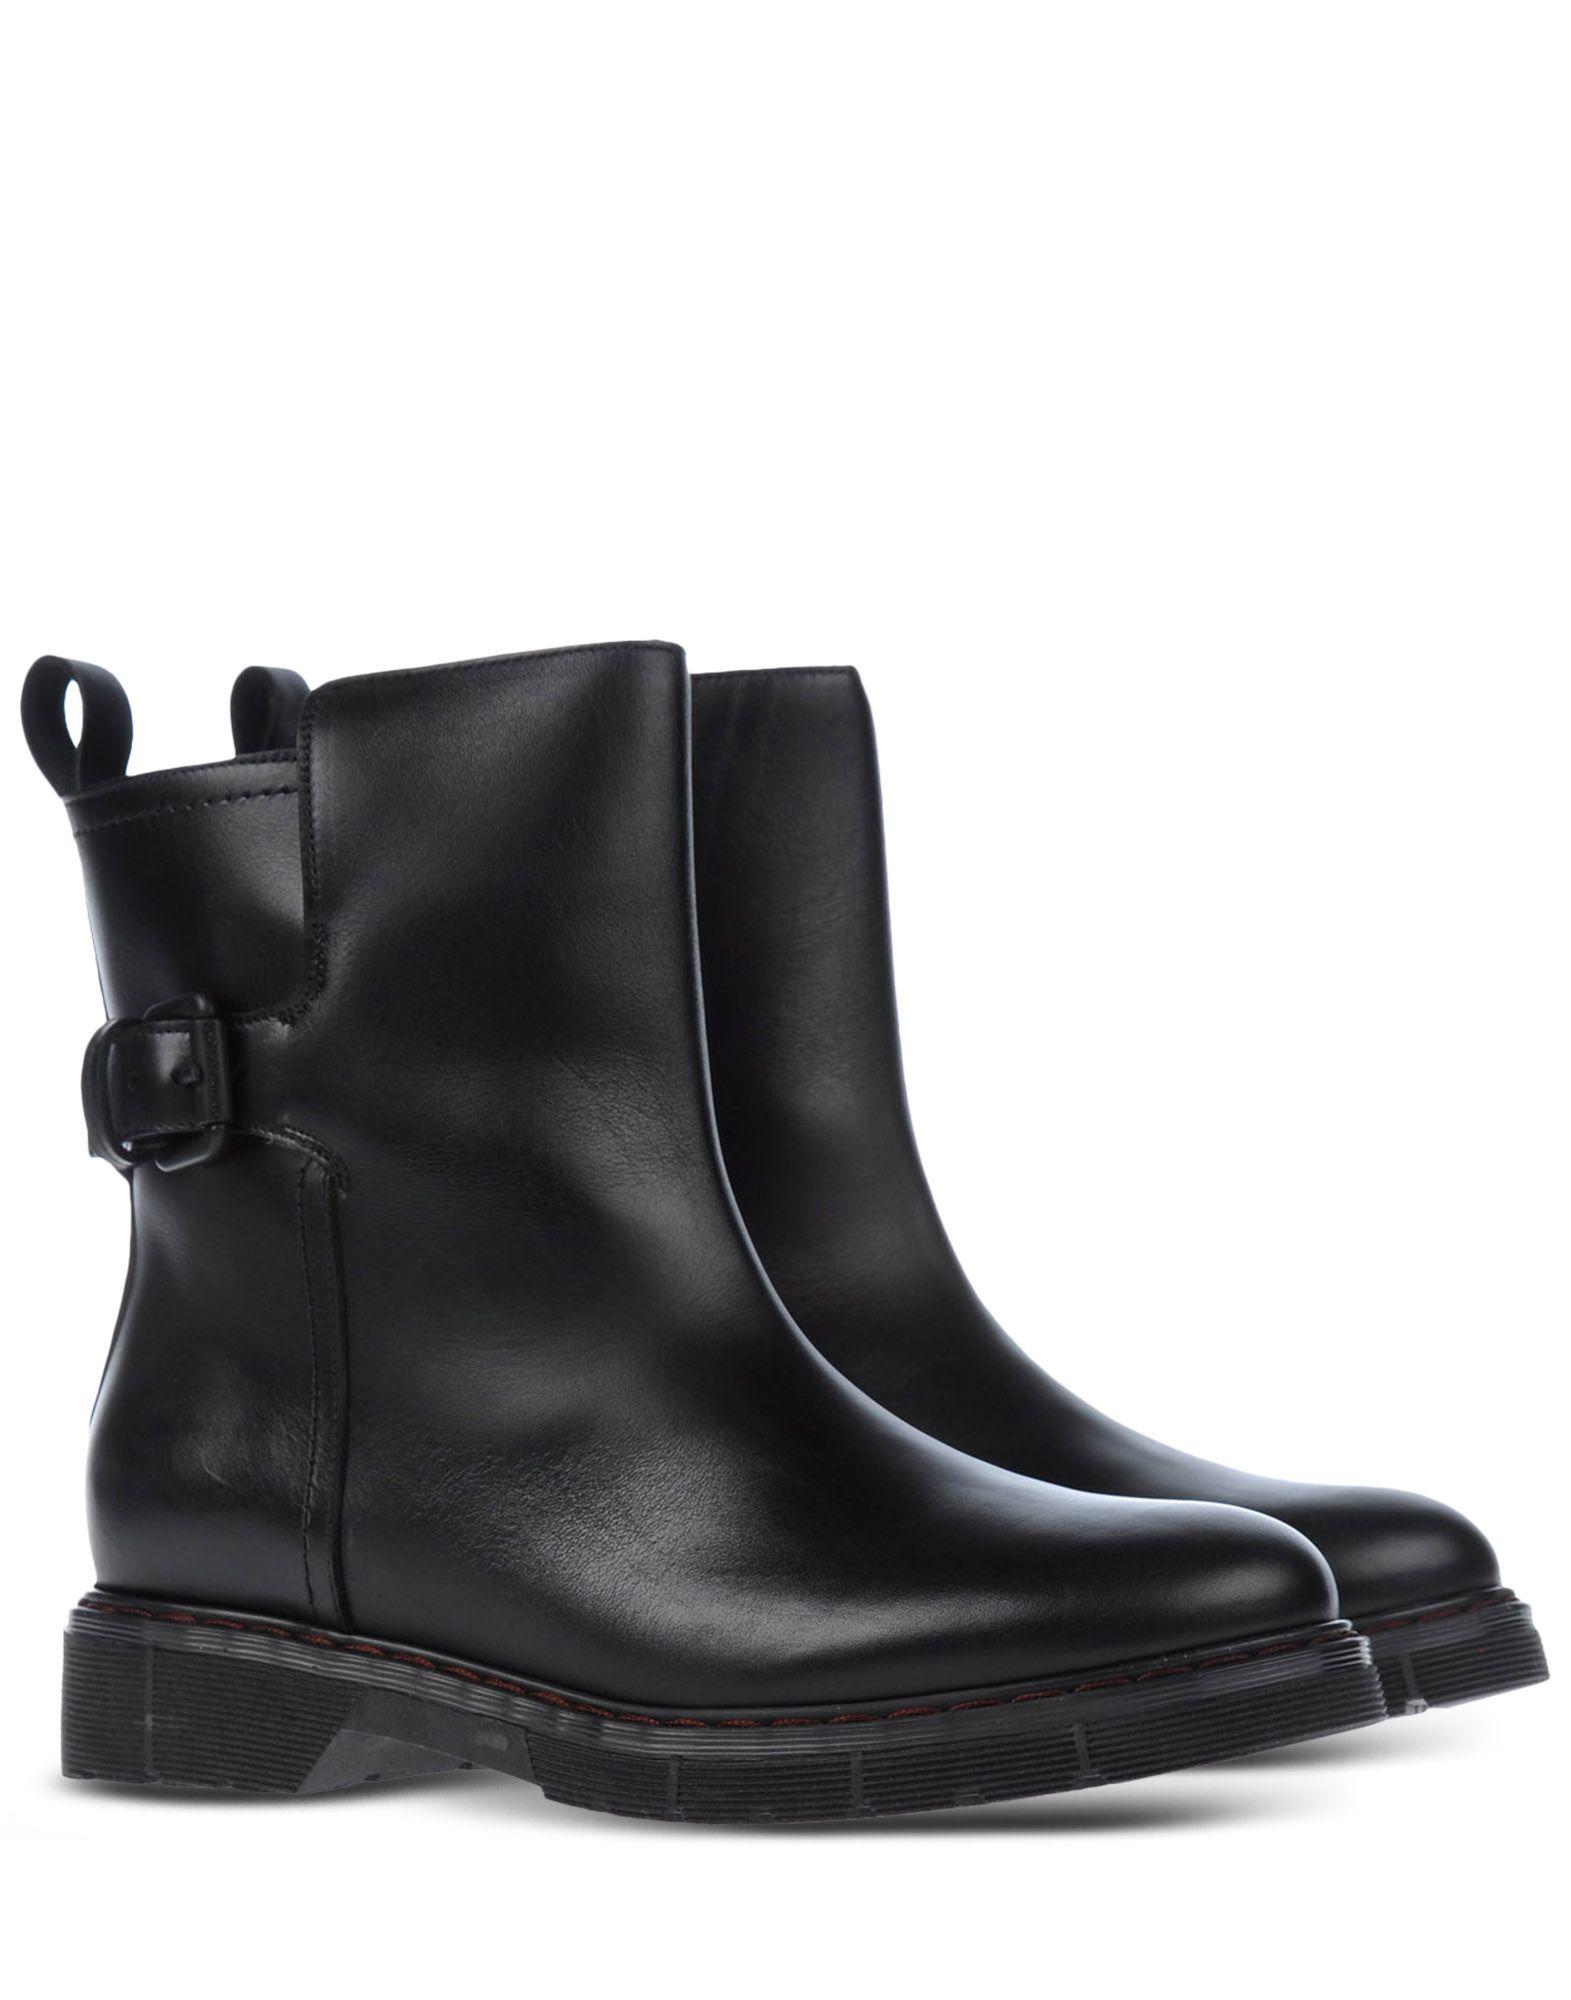 l 39 autre chose ankle boots in black lyst. Black Bedroom Furniture Sets. Home Design Ideas